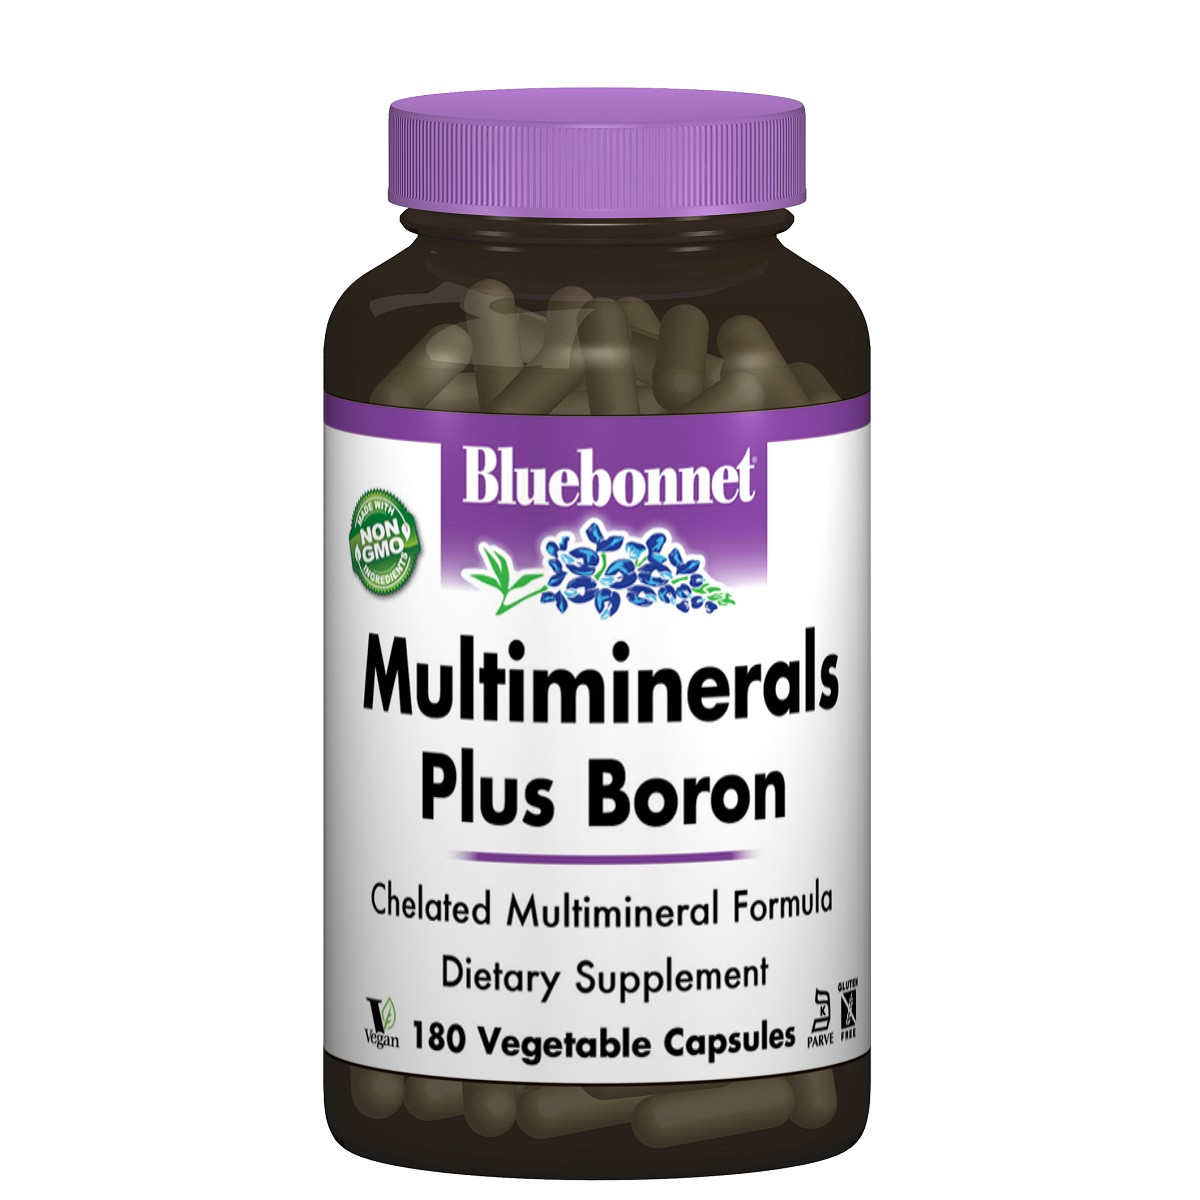 Мультиминералы + Бор с Железом, Bluebonnet Nutrition, 180 гелевых капсул